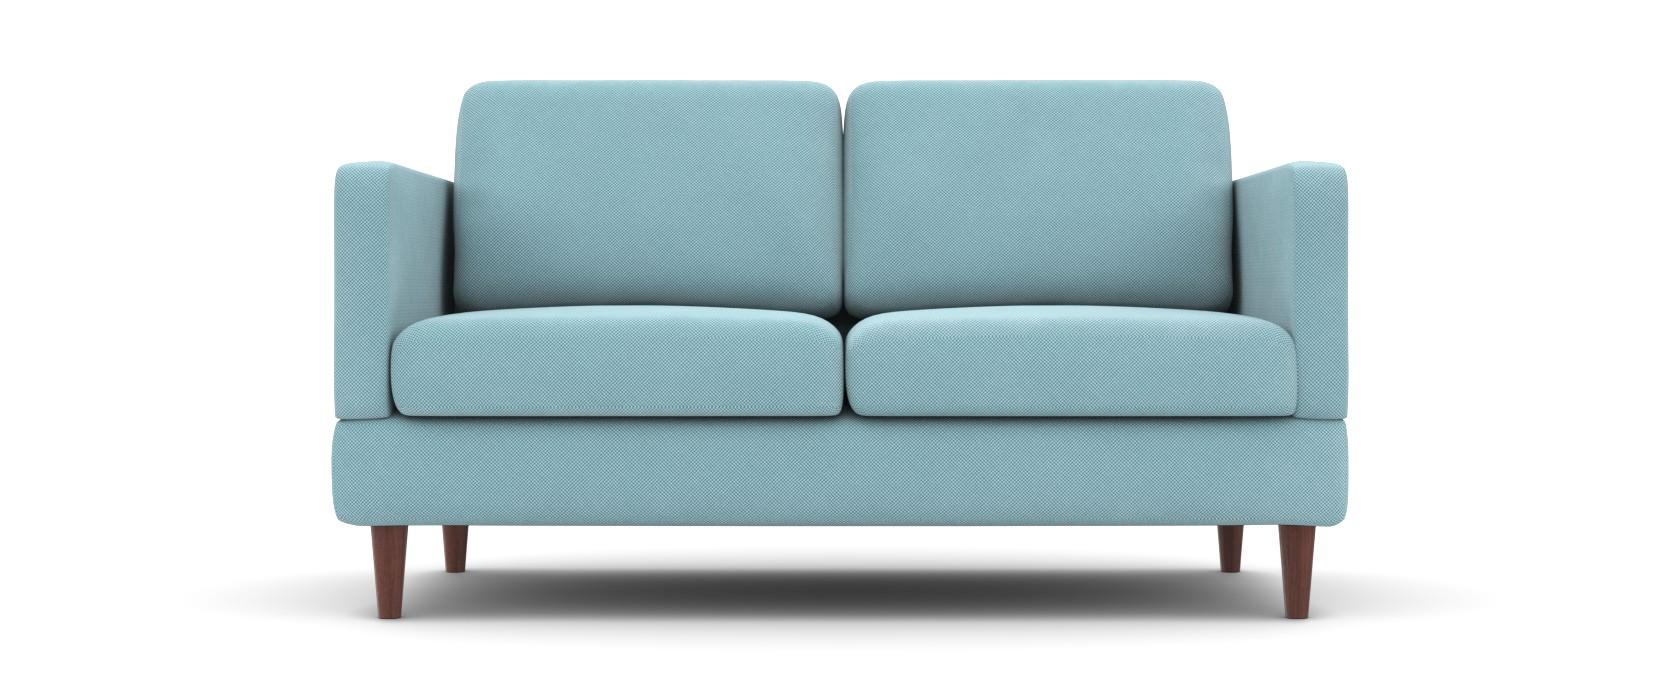 Двомісній диван Bruno Club - Pufetto